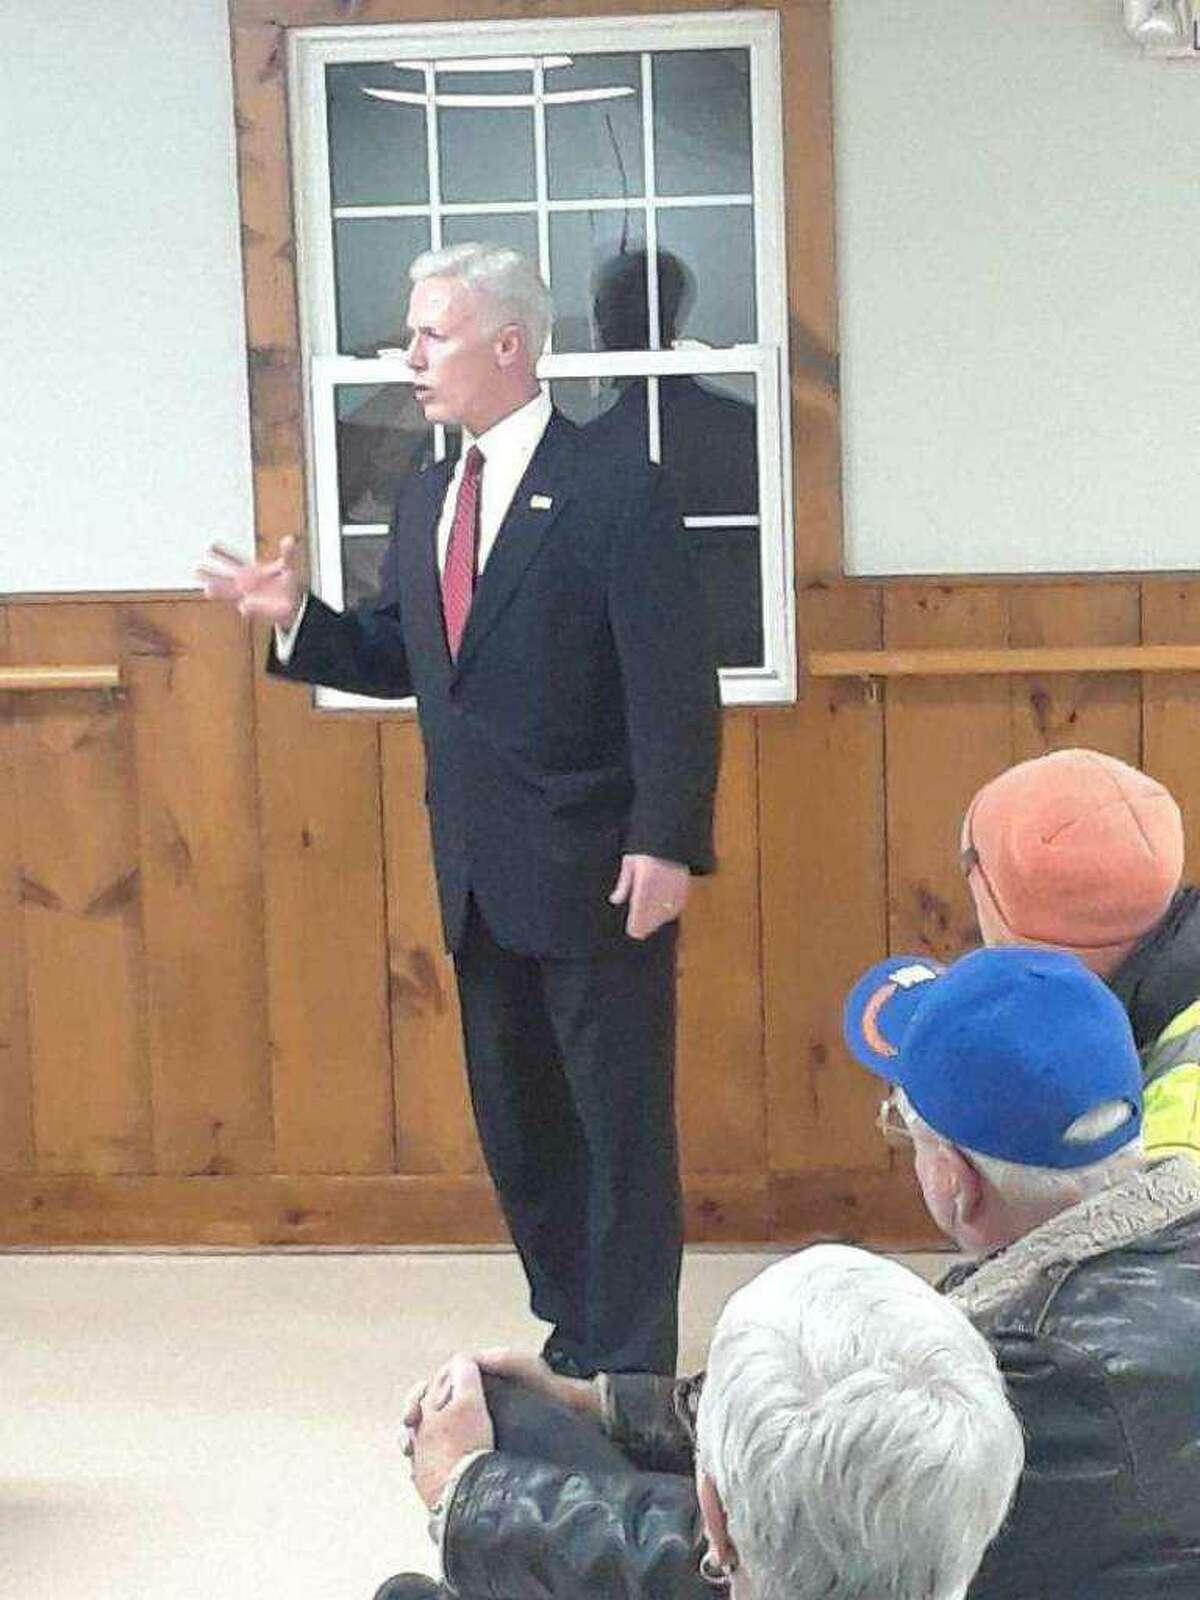 Republican David X. Sullivan, of New Fairfield, challenging U.S. Rep. Jahana Hayes.